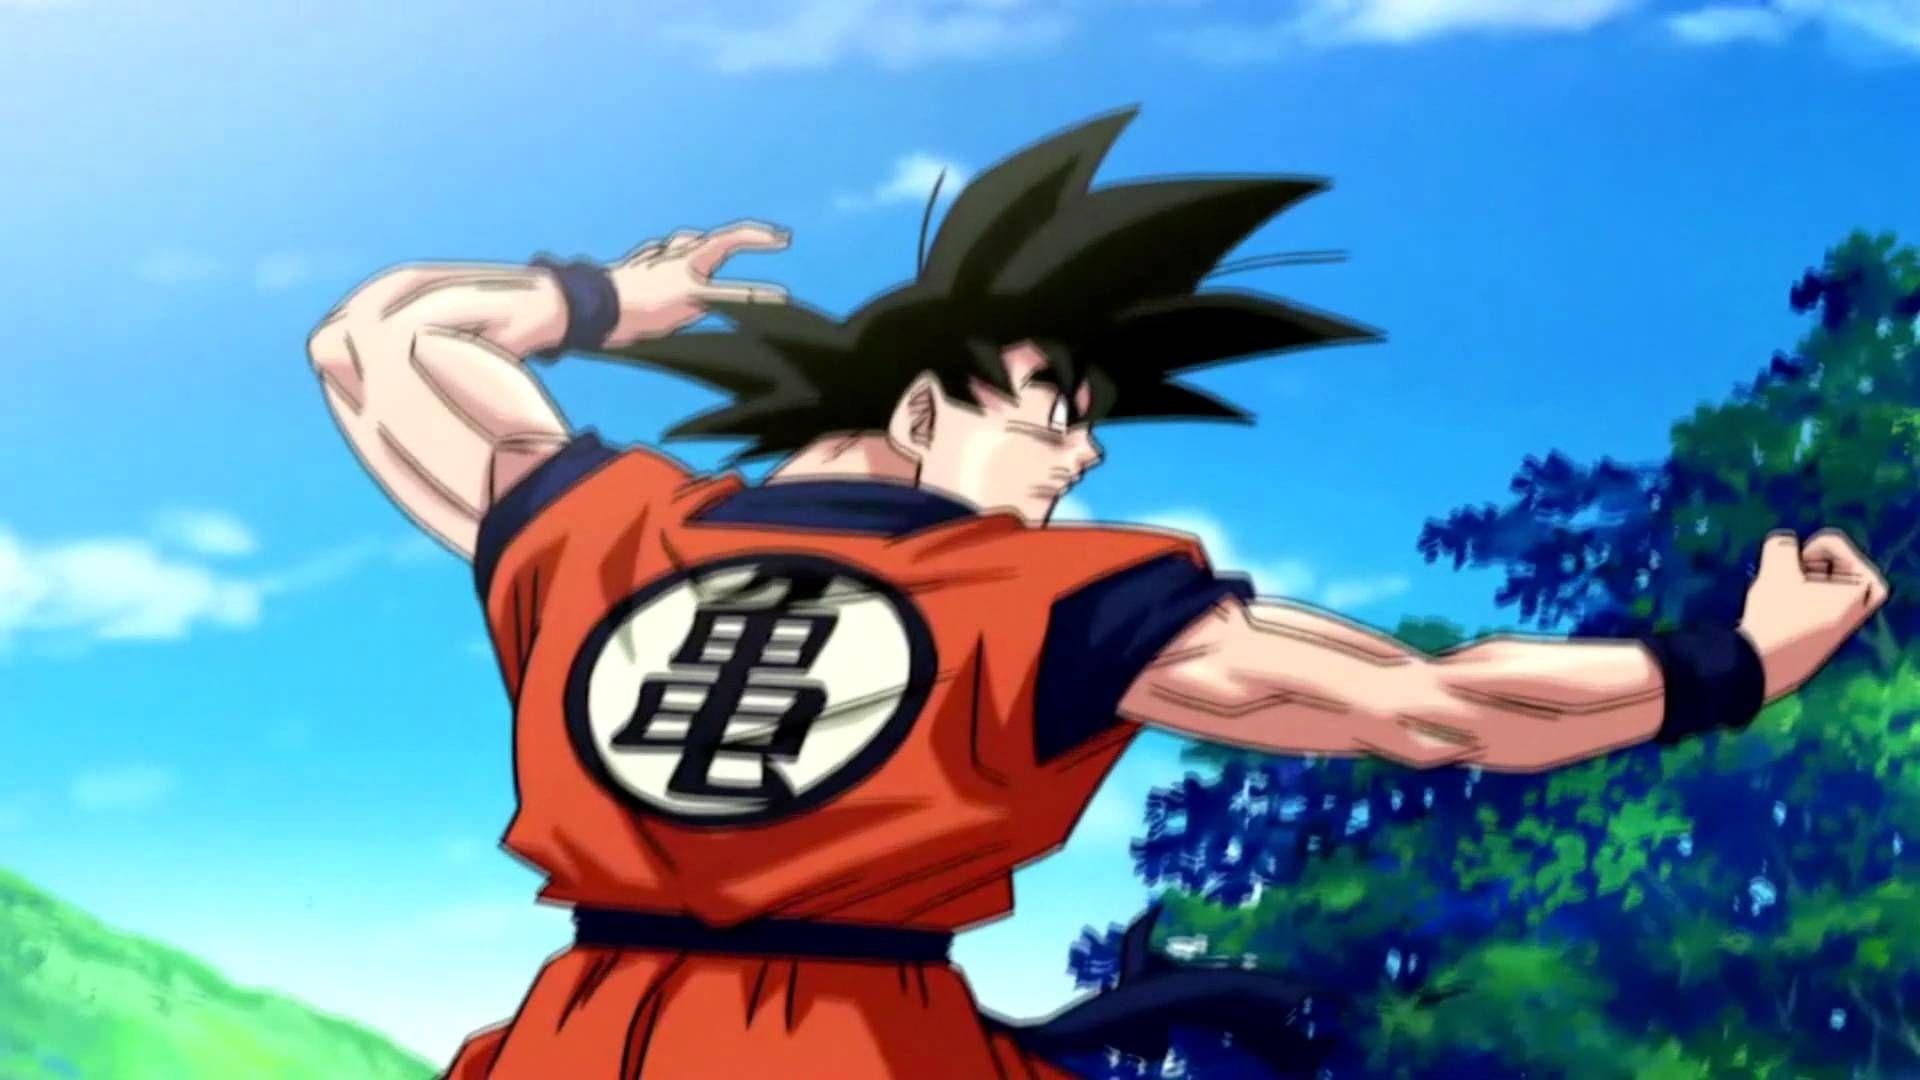 Dragon Ball Z Kai Full Opening English Hd 1080p Youtube Dragon